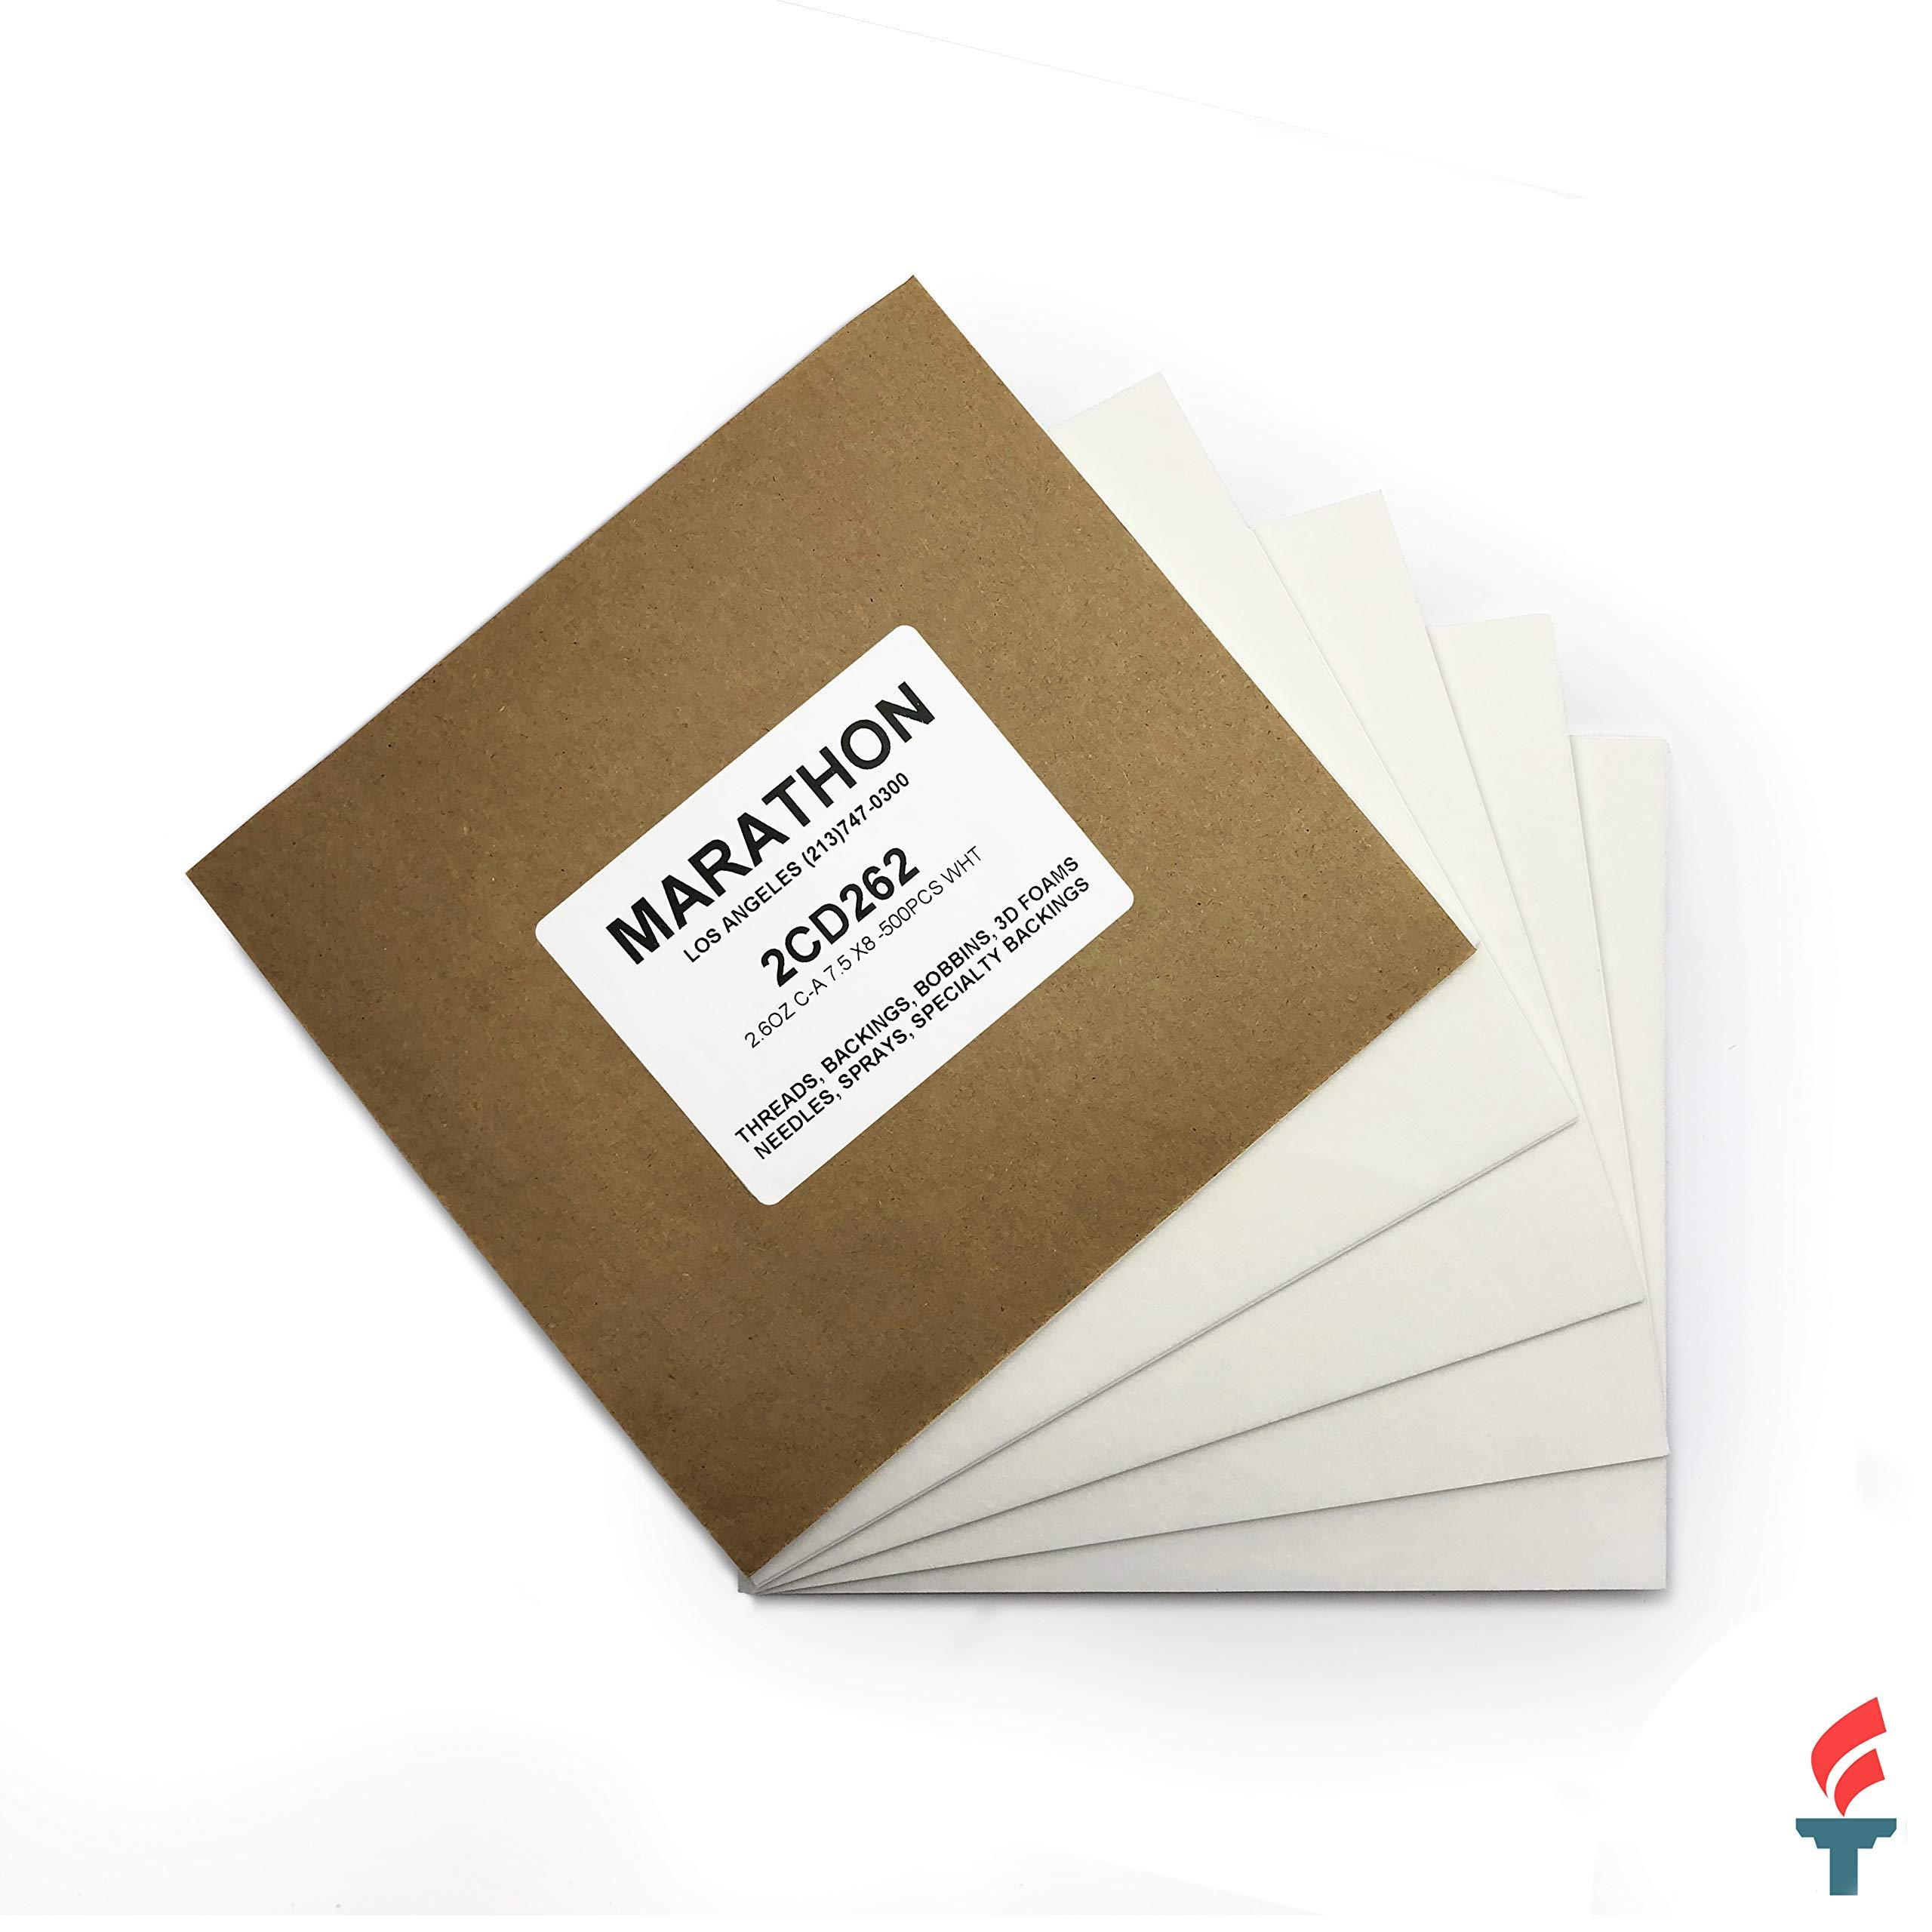 Marathon - Dispenser Roll Paper Towels, 350 Ft. Rolls - 12 Rolls by Marathon (Image #2)